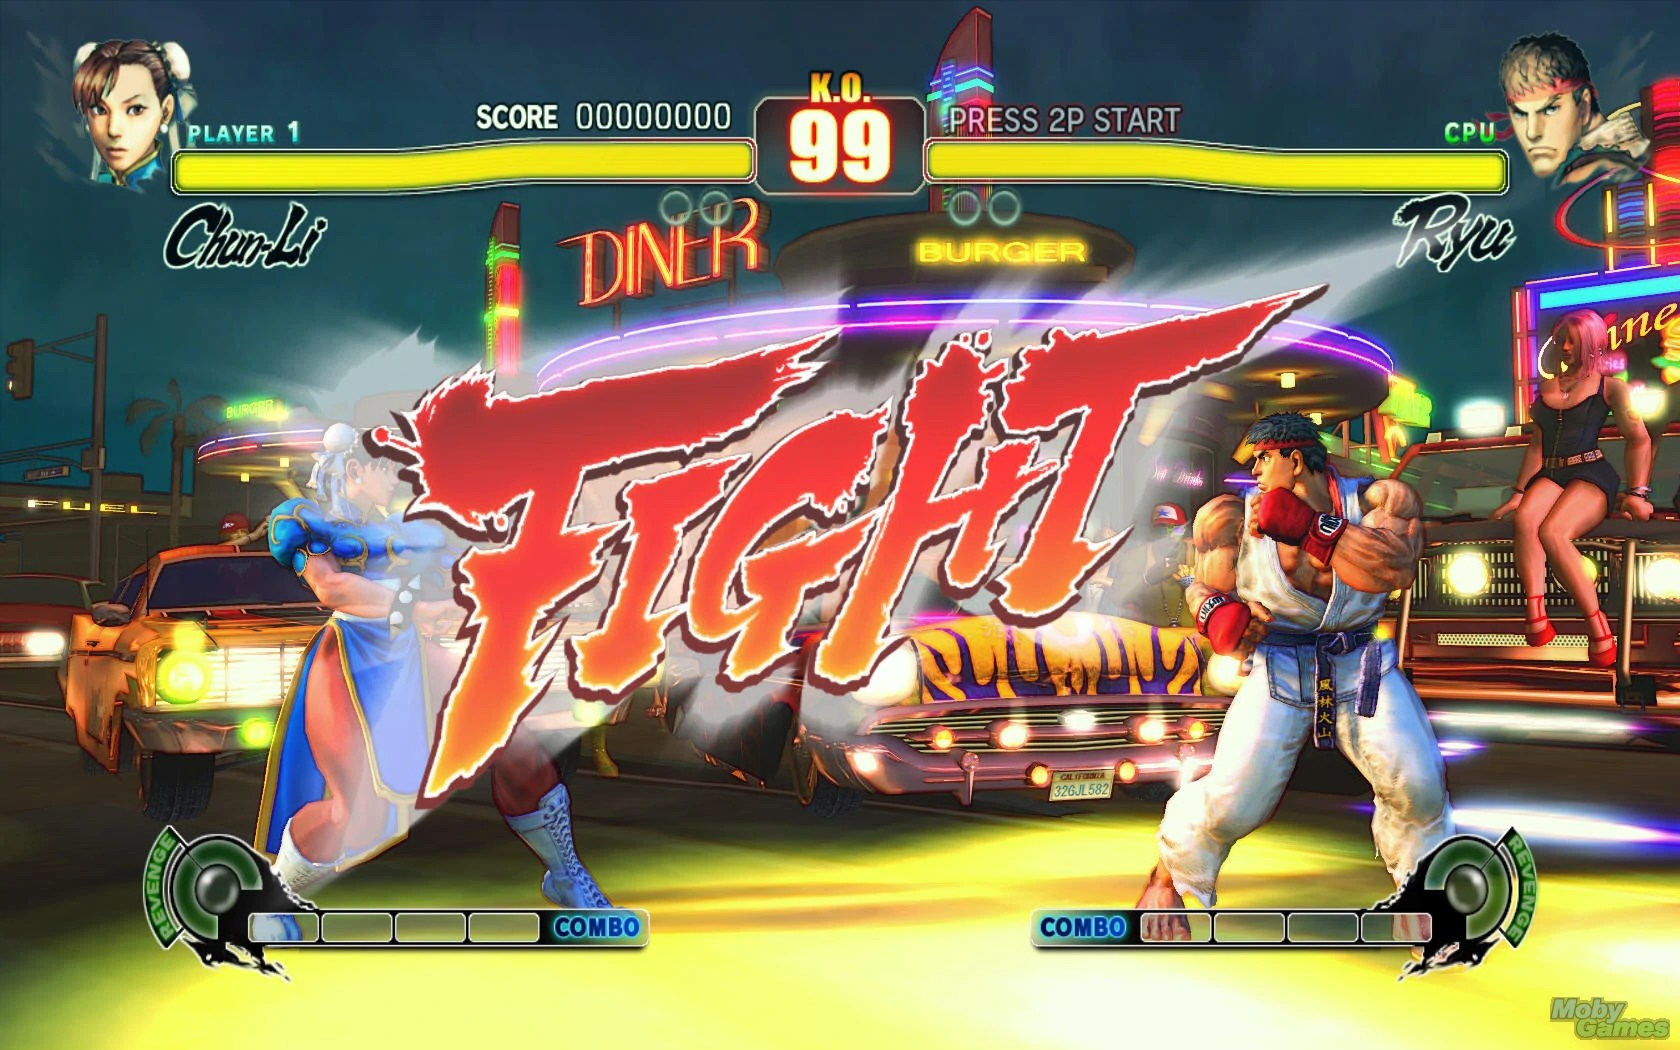 Screen Shot Wallpaper Gravity Falls Health Meter Street Fighter Wiki Fandom Powered By Wikia